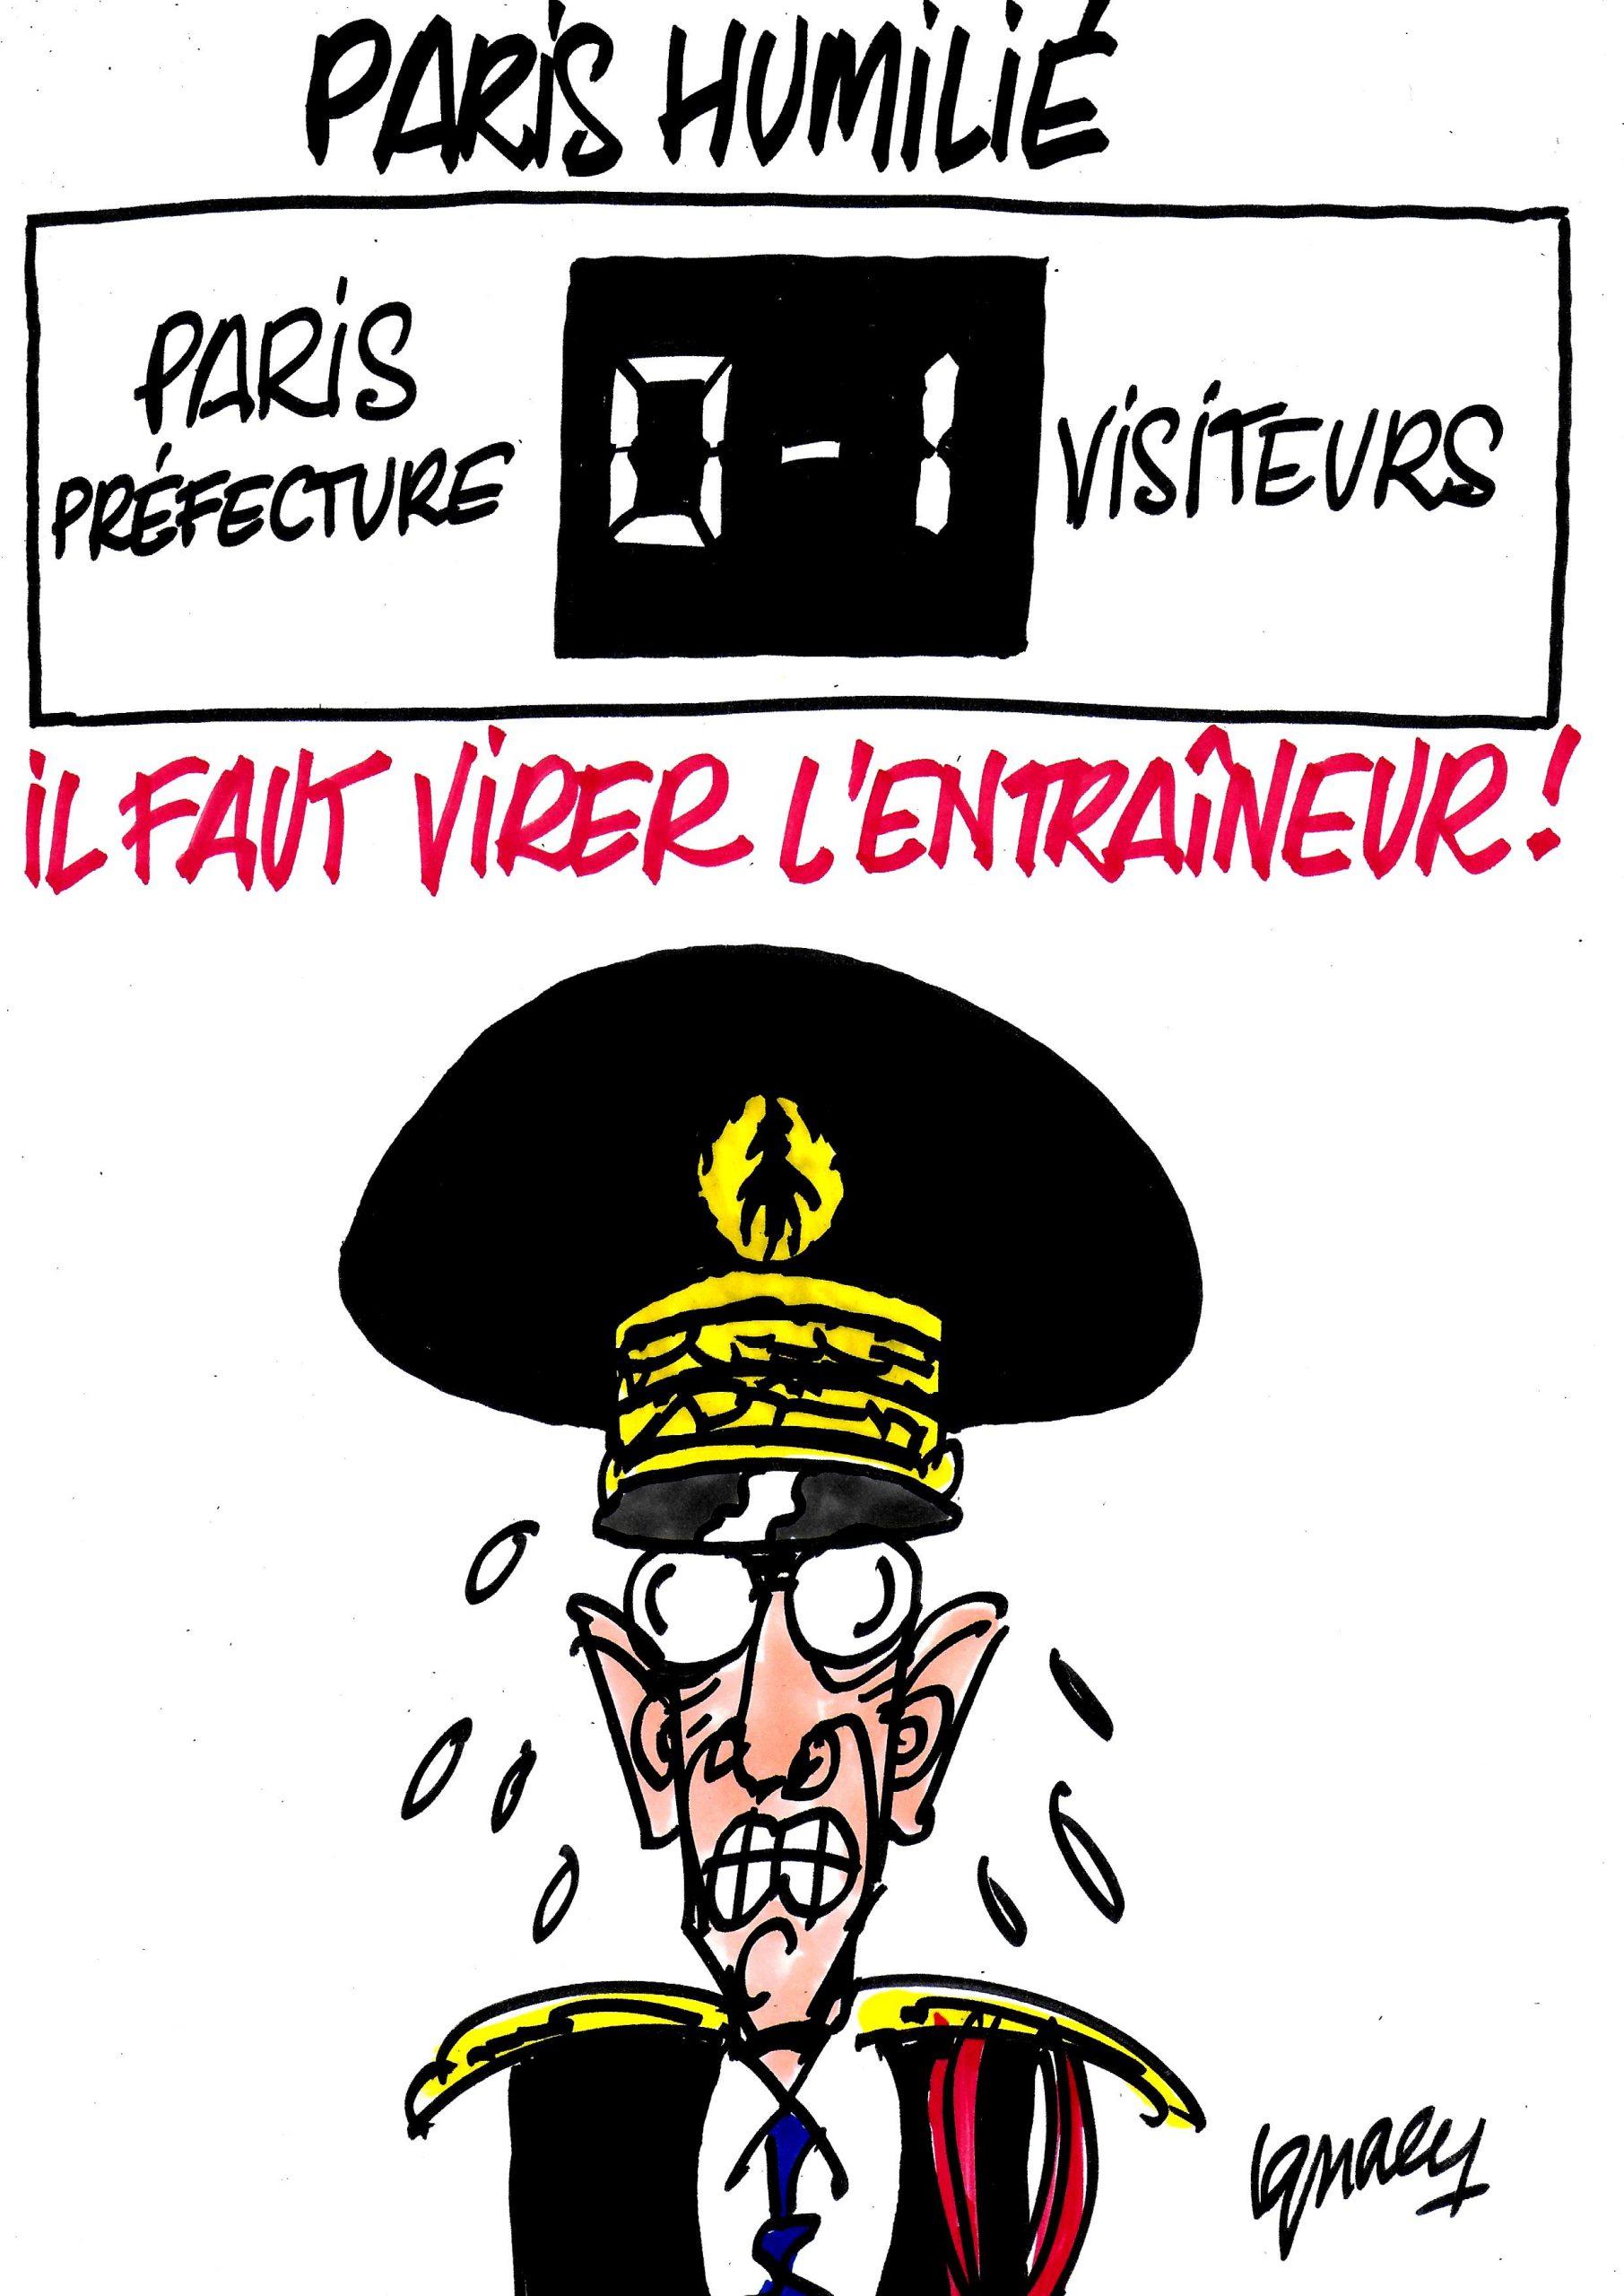 Ignace - Paris humilié